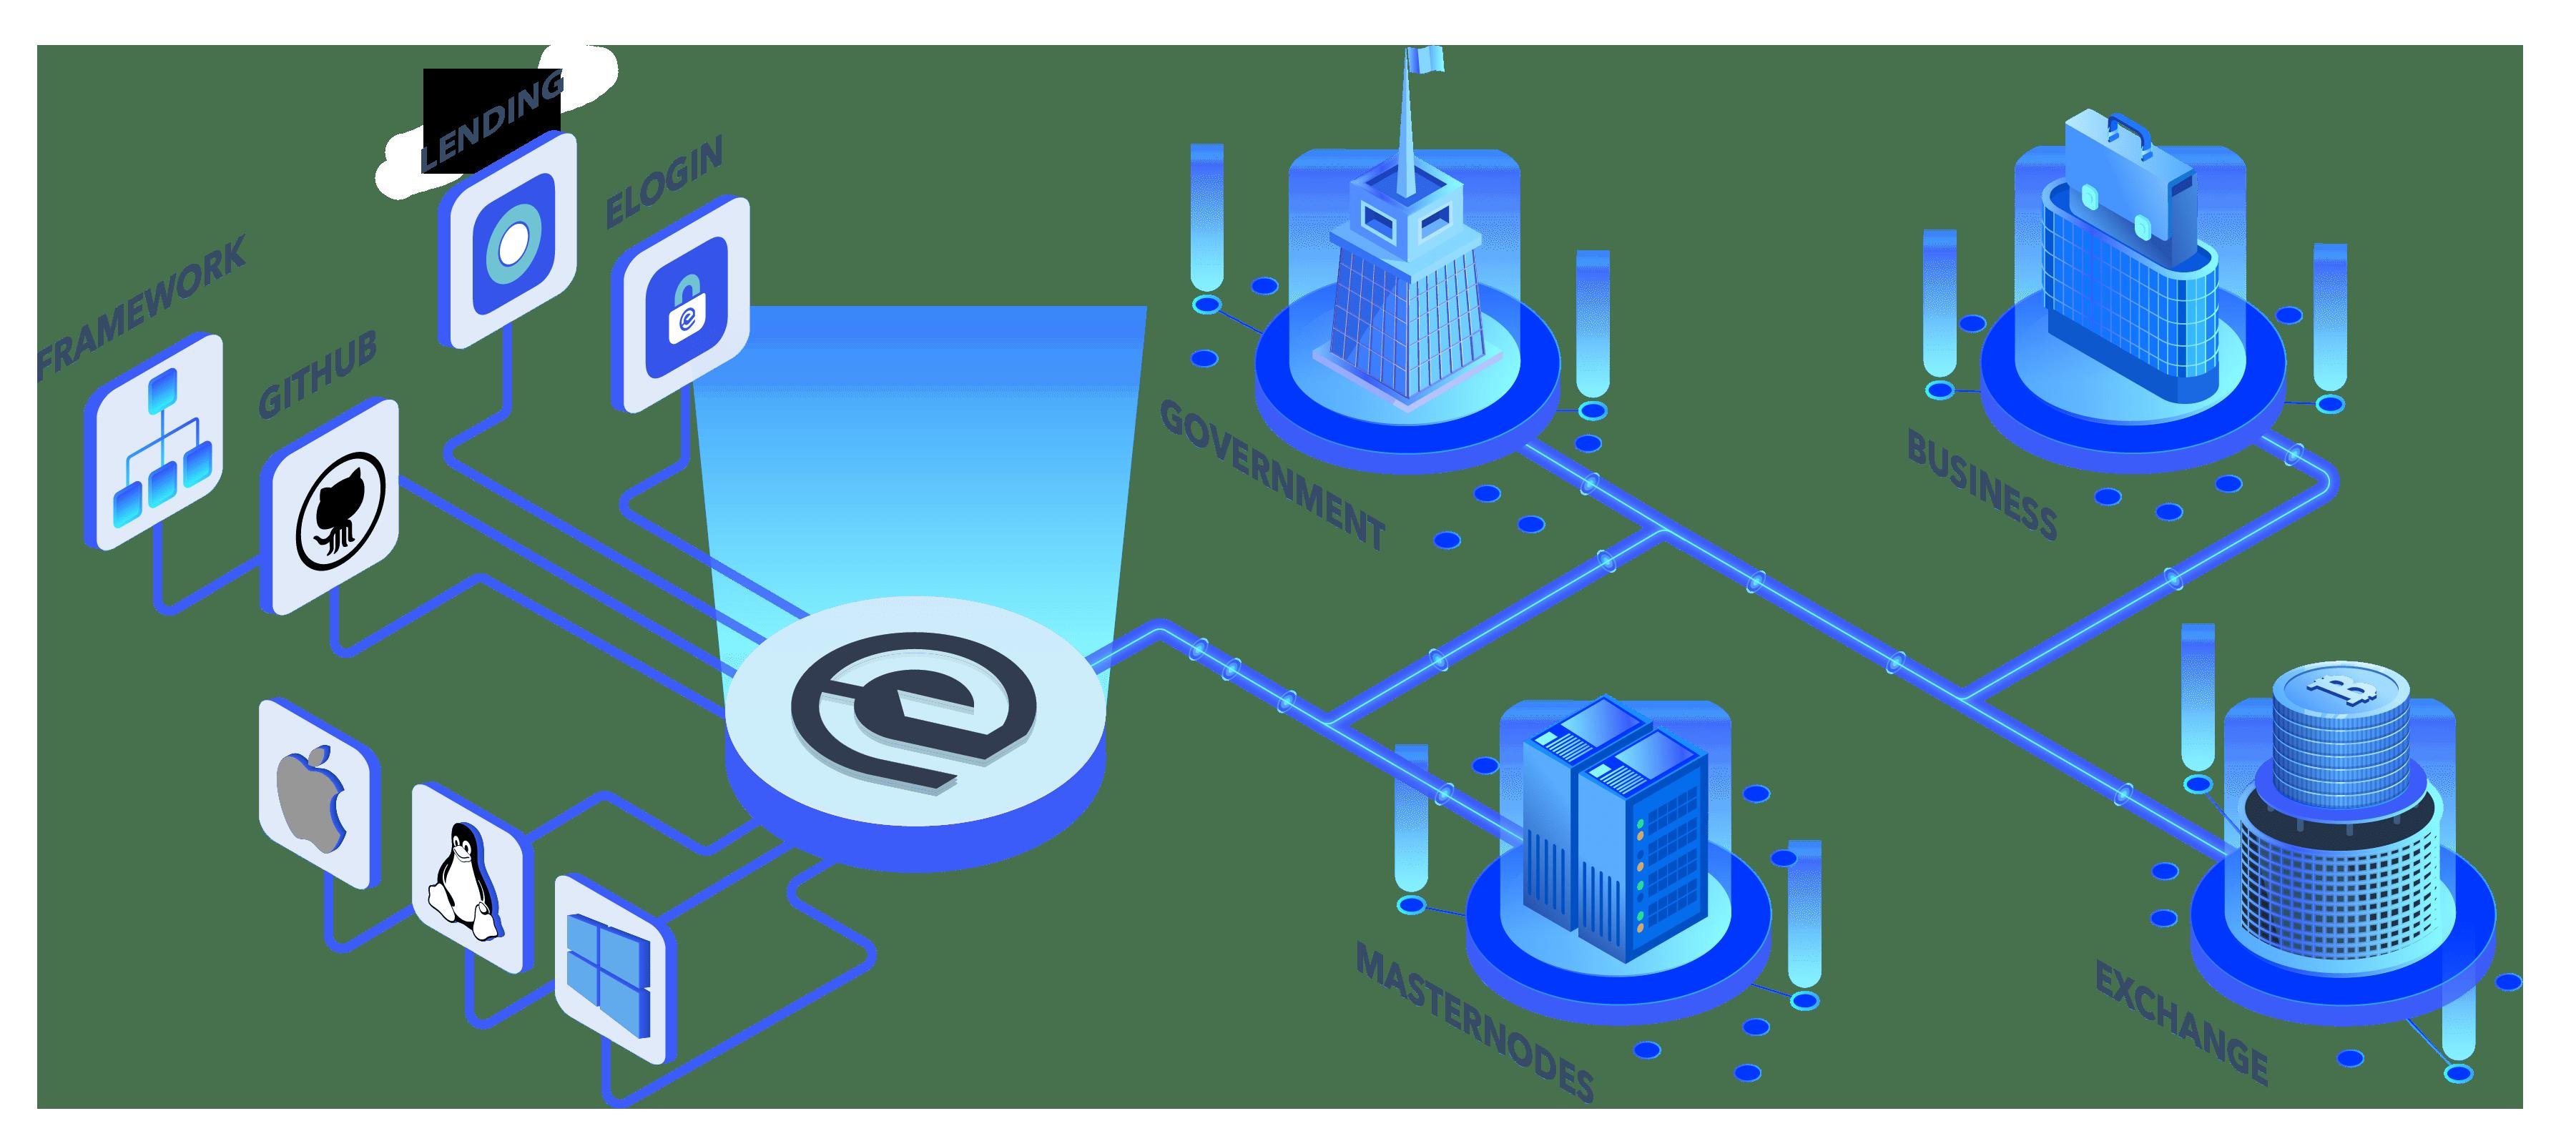 ess-framework